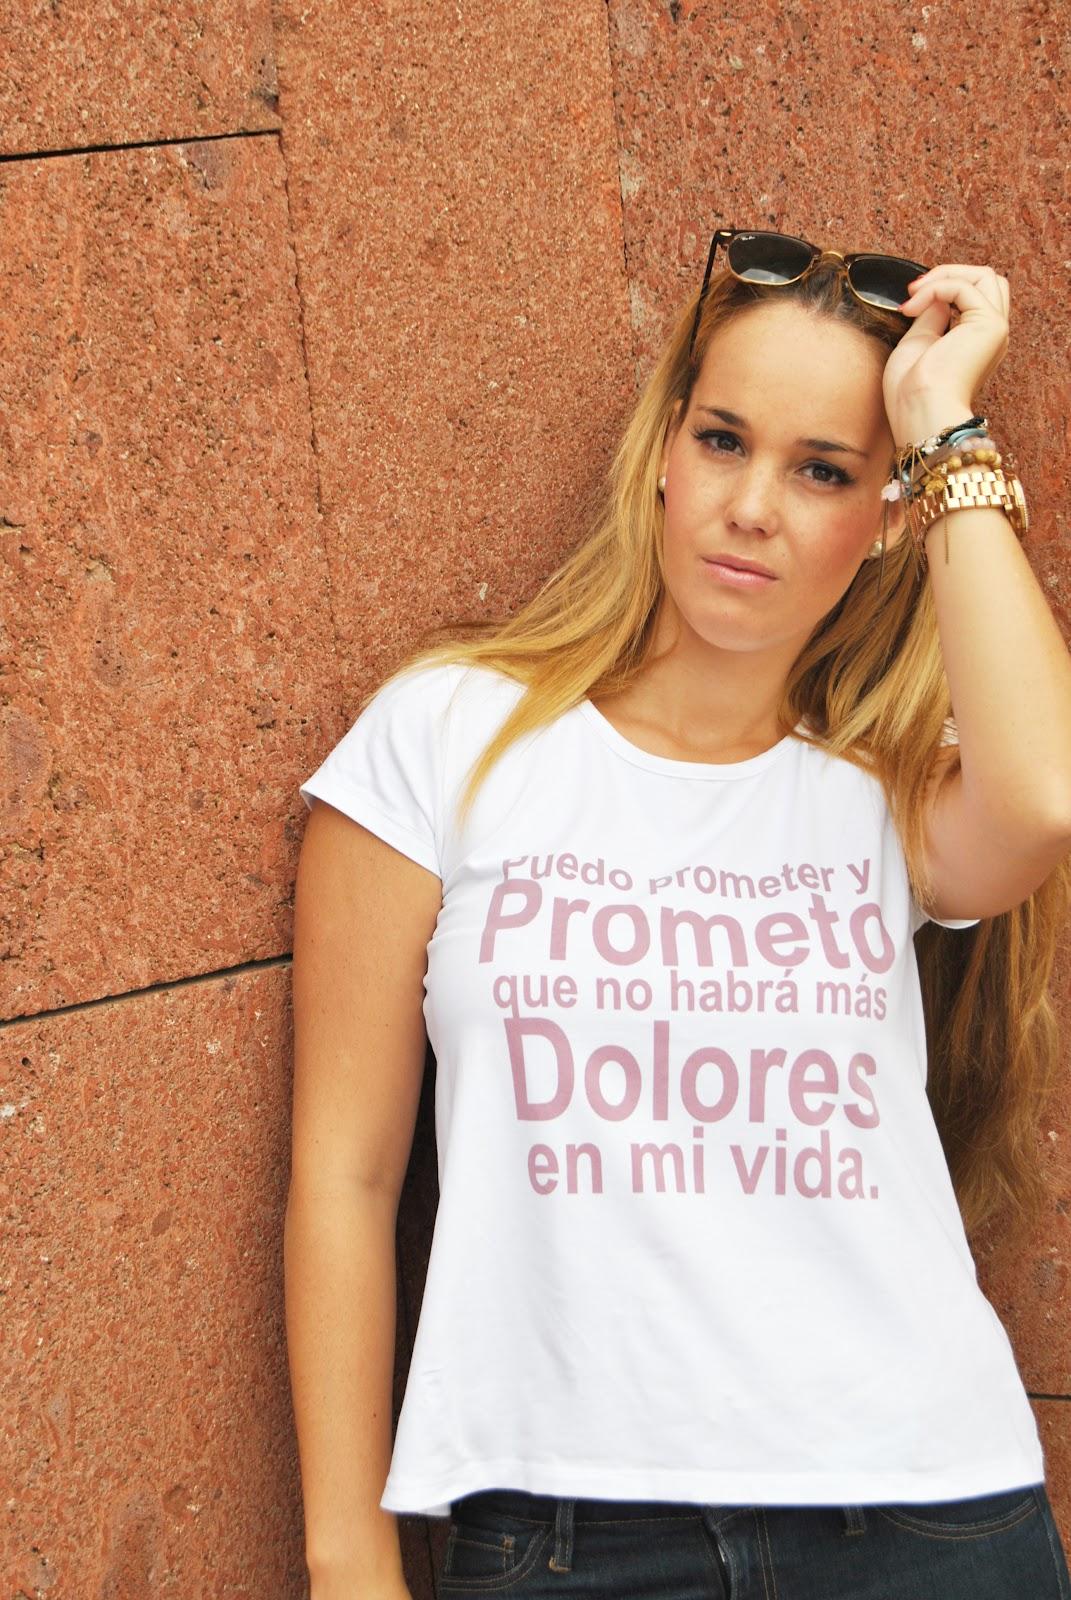 nery hdez, dolores promesas, camisa con mensaje, sport look